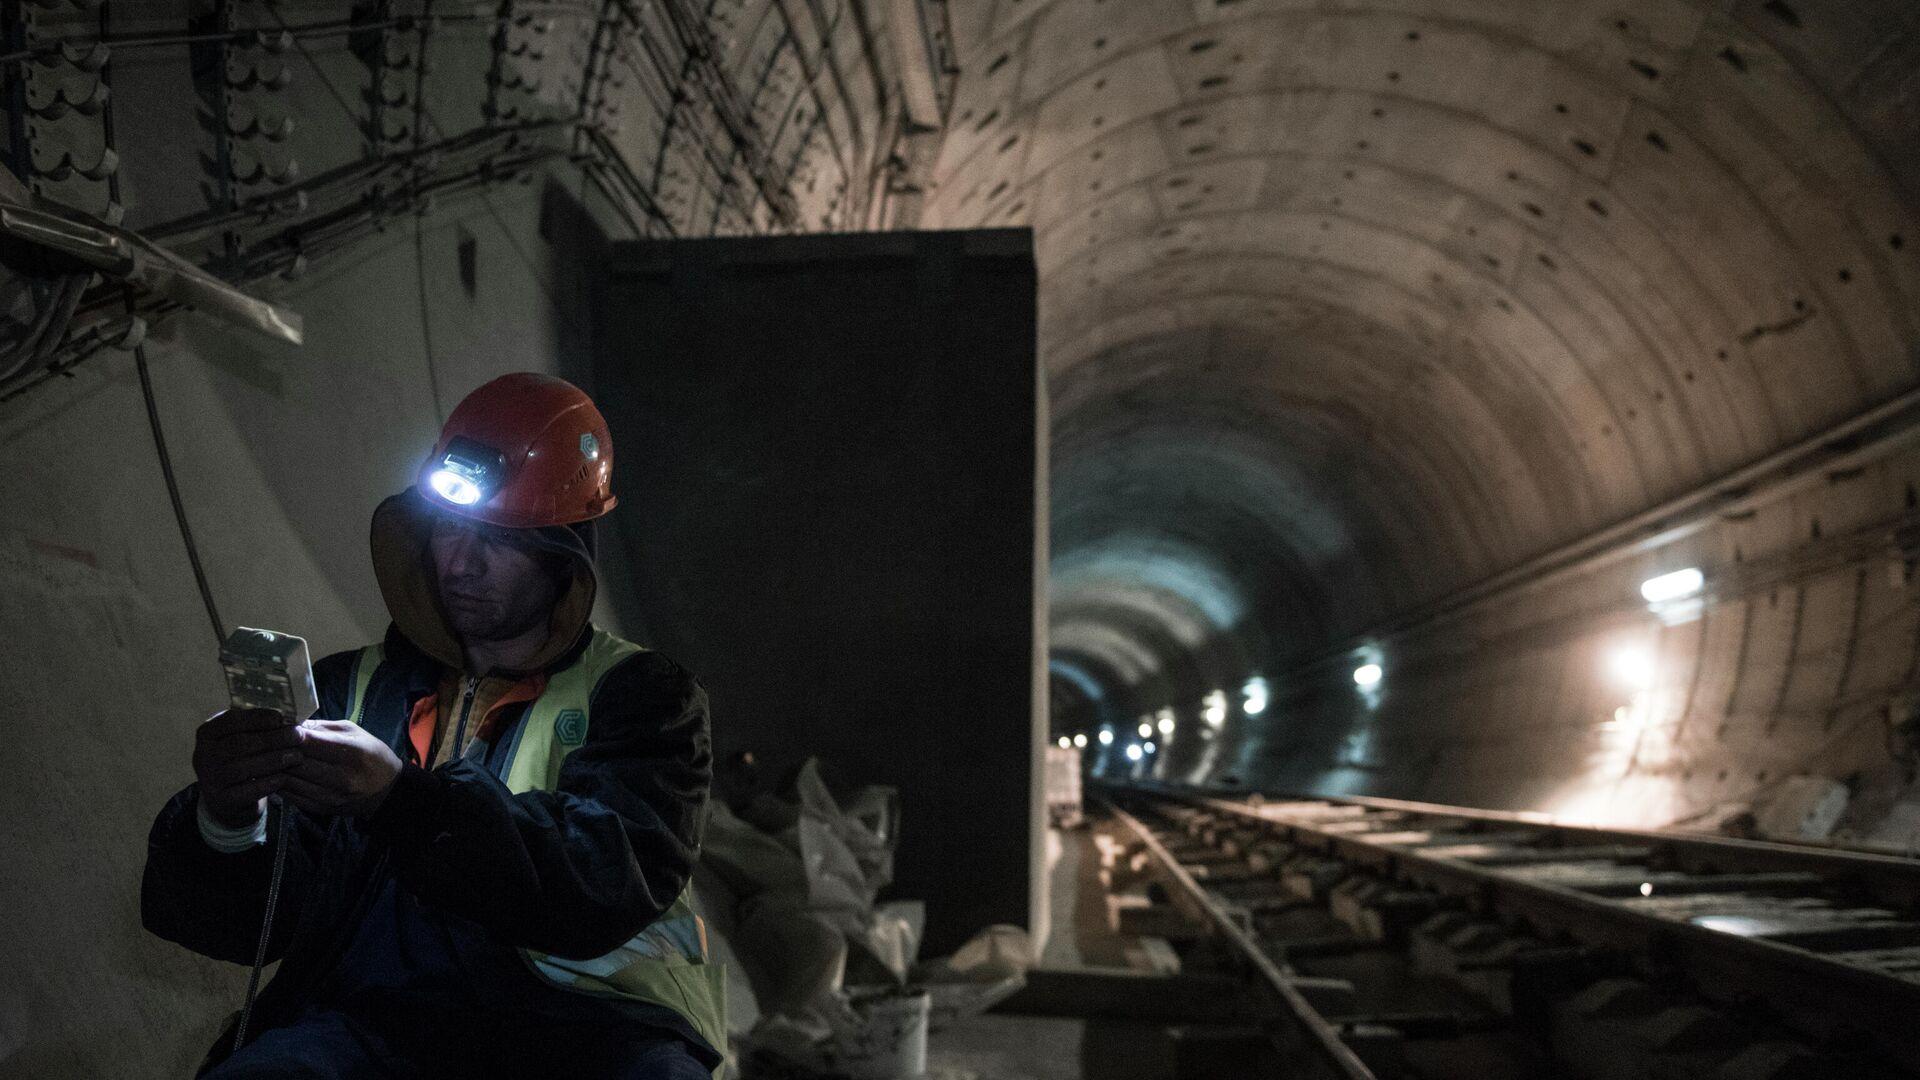 Строительство тоннеля на БАМ - РИА Новости, 1920, 05.04.2021